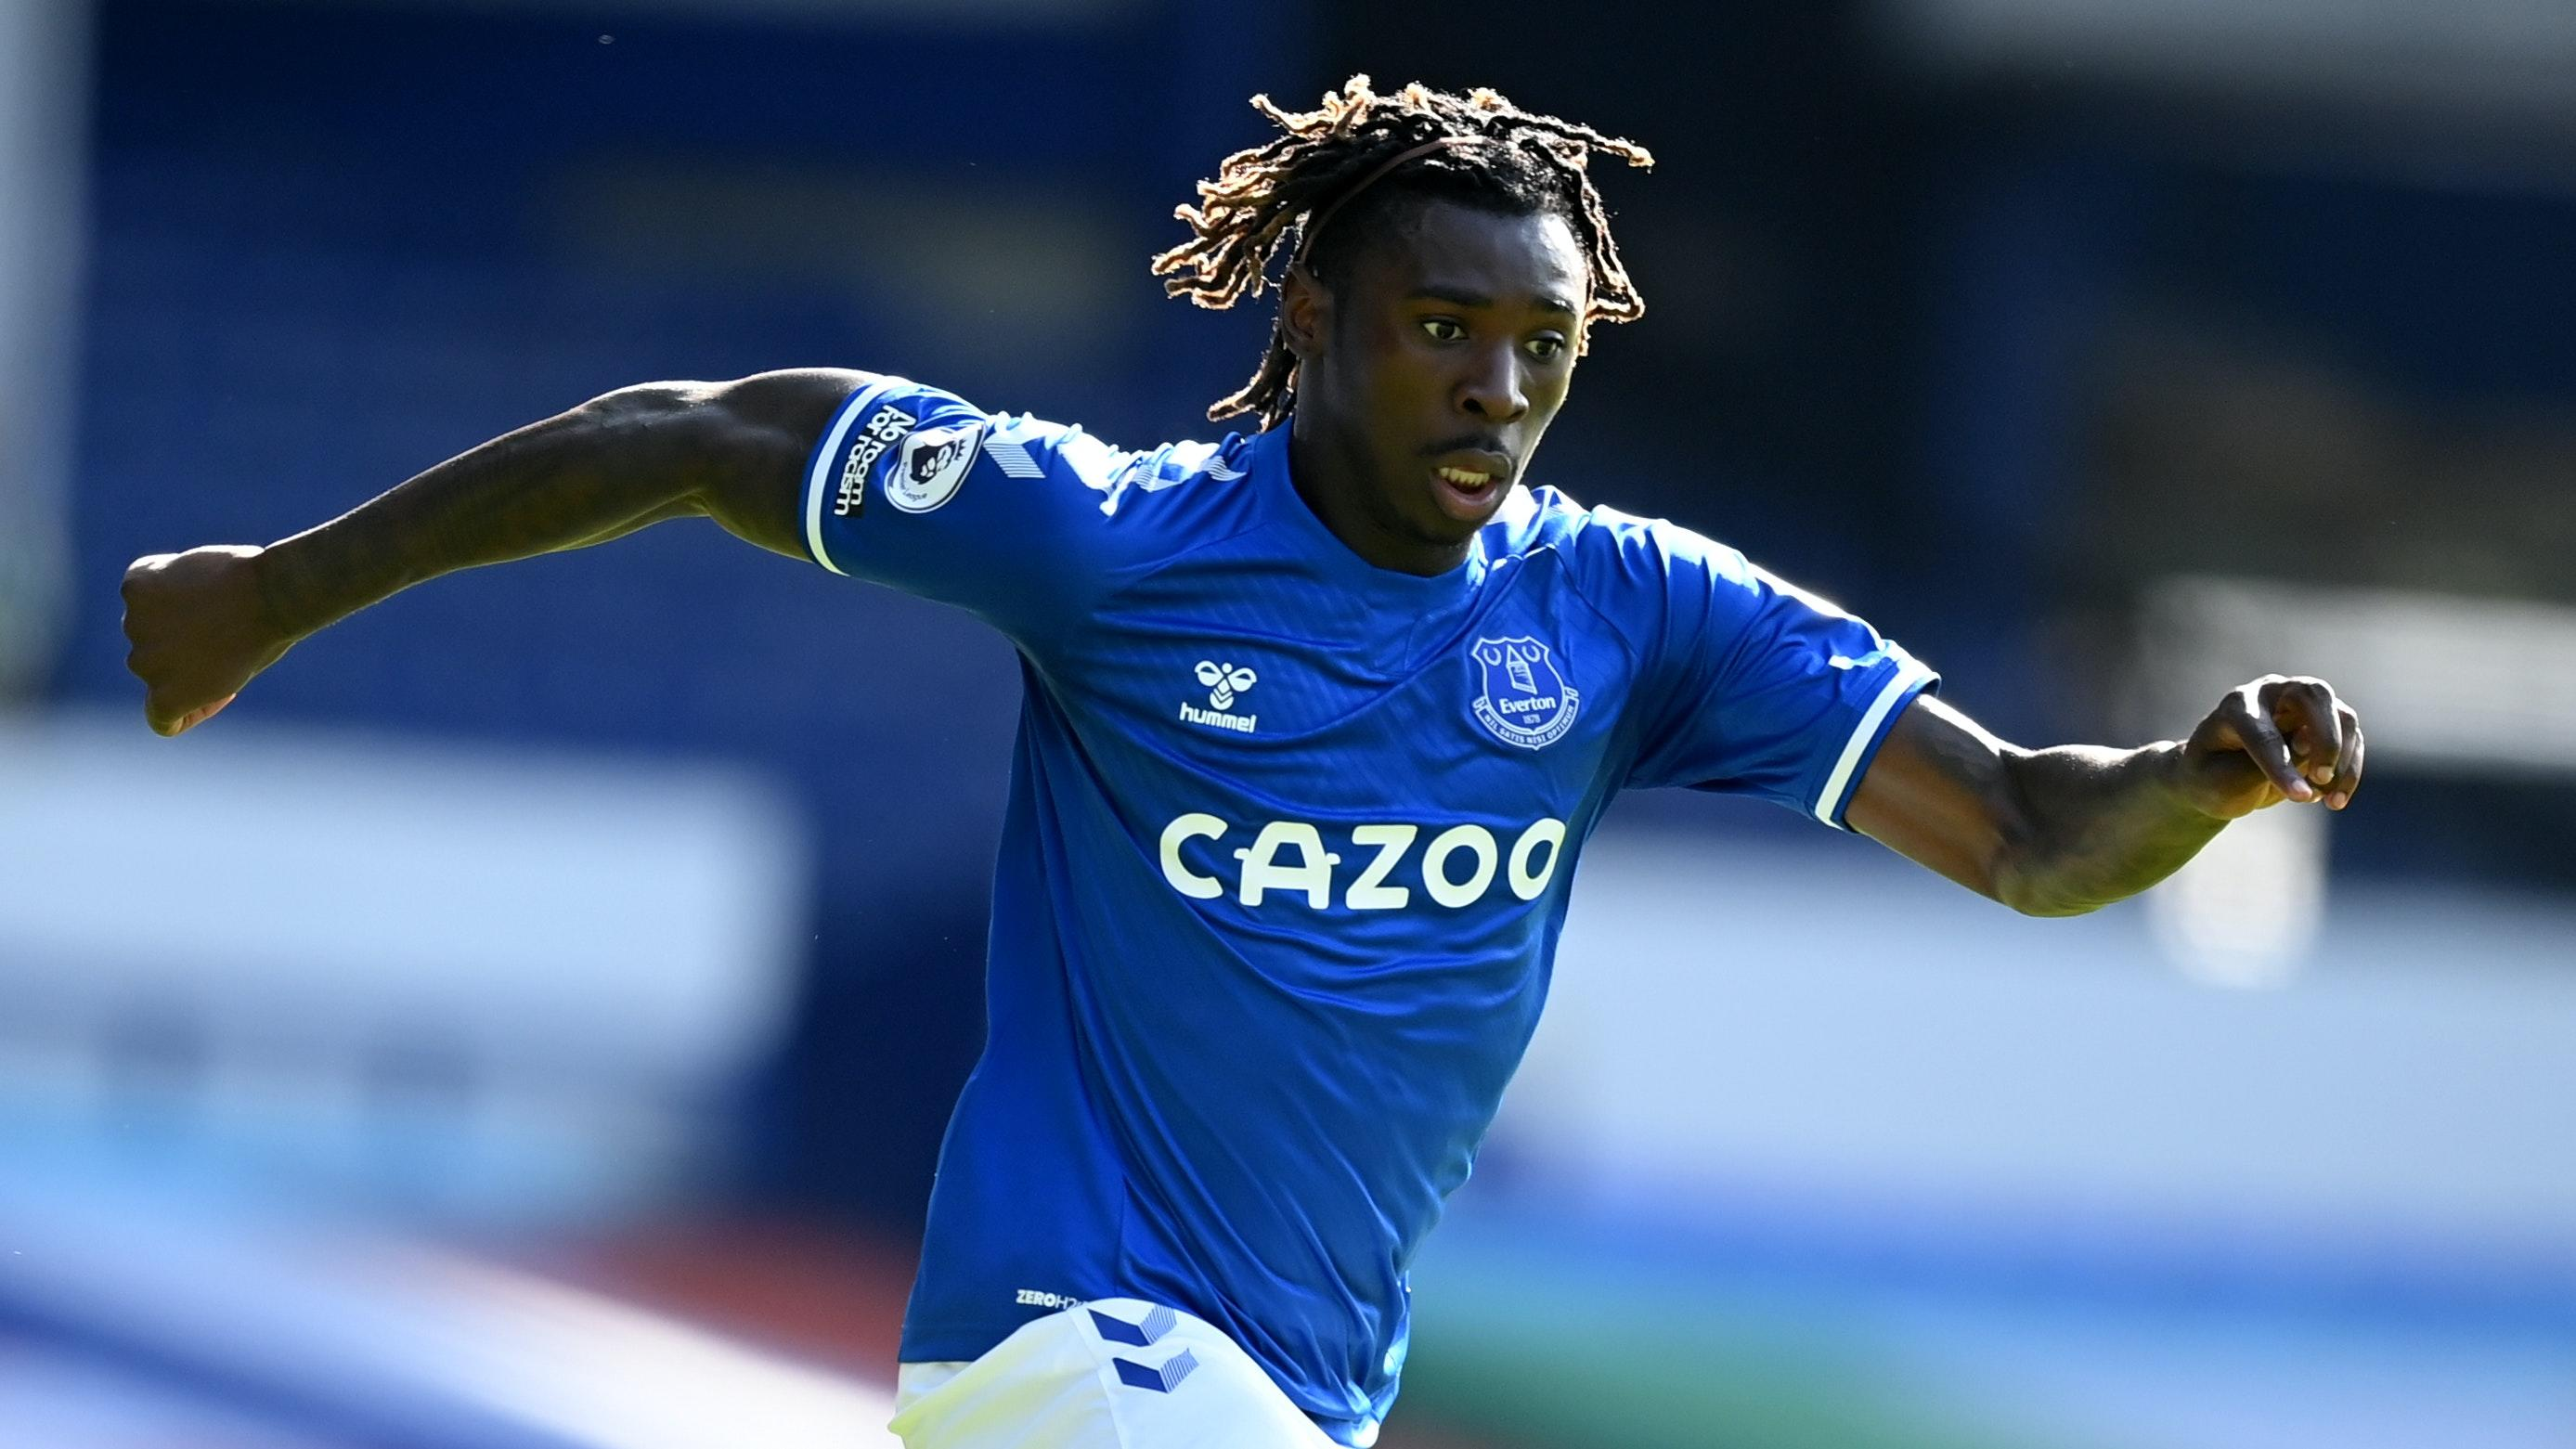 Moise Kean seals loan switch from Everton to Paris St Germain